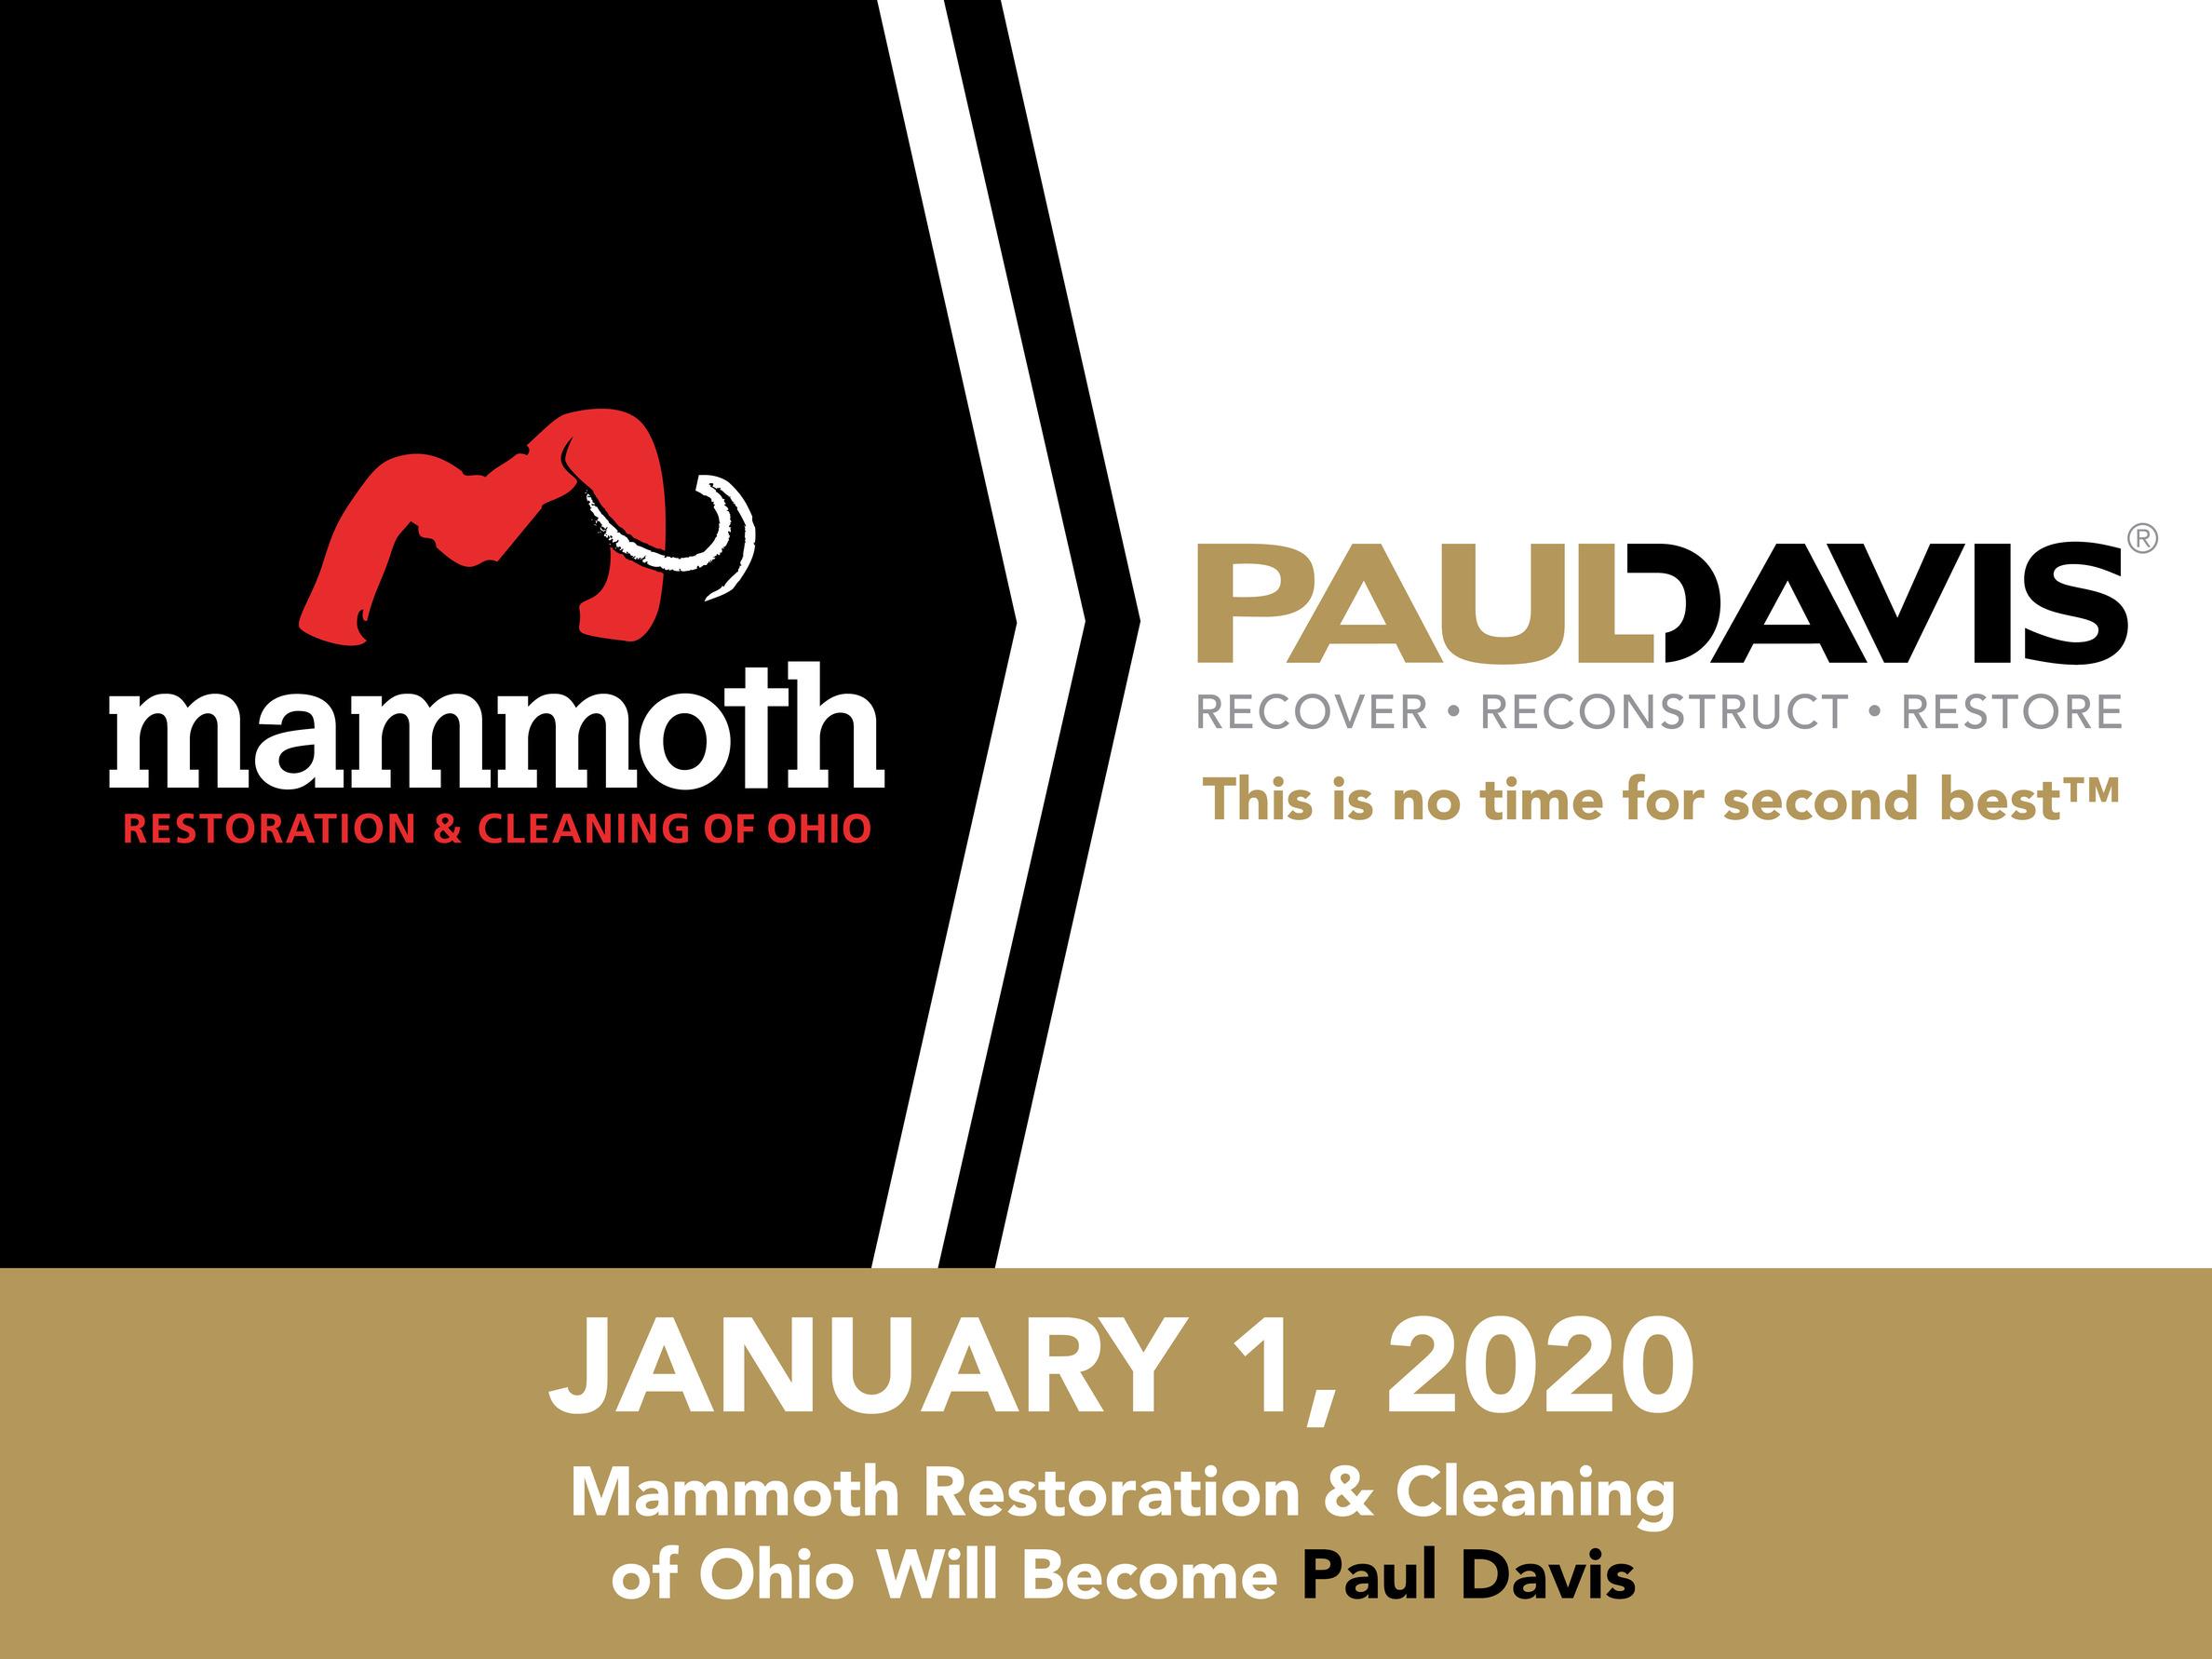 Mammoth Restoration